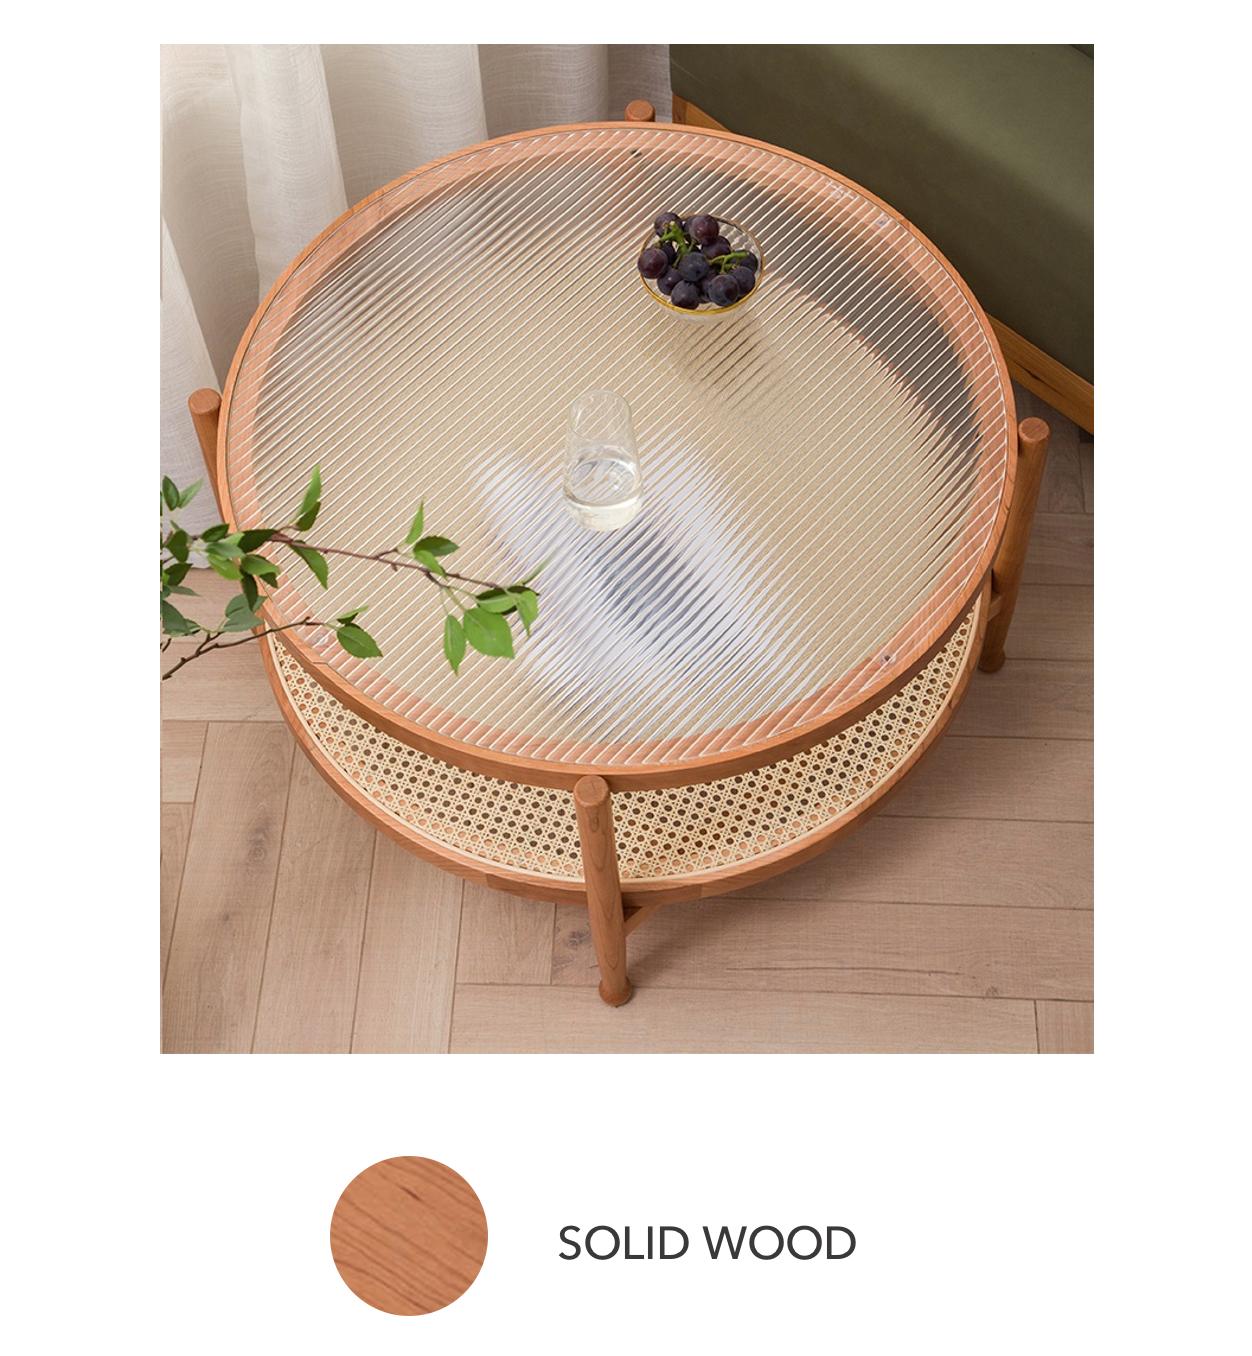 guri_oak_scandinavian_rattan_round_table_800_material_by_born_in_colour